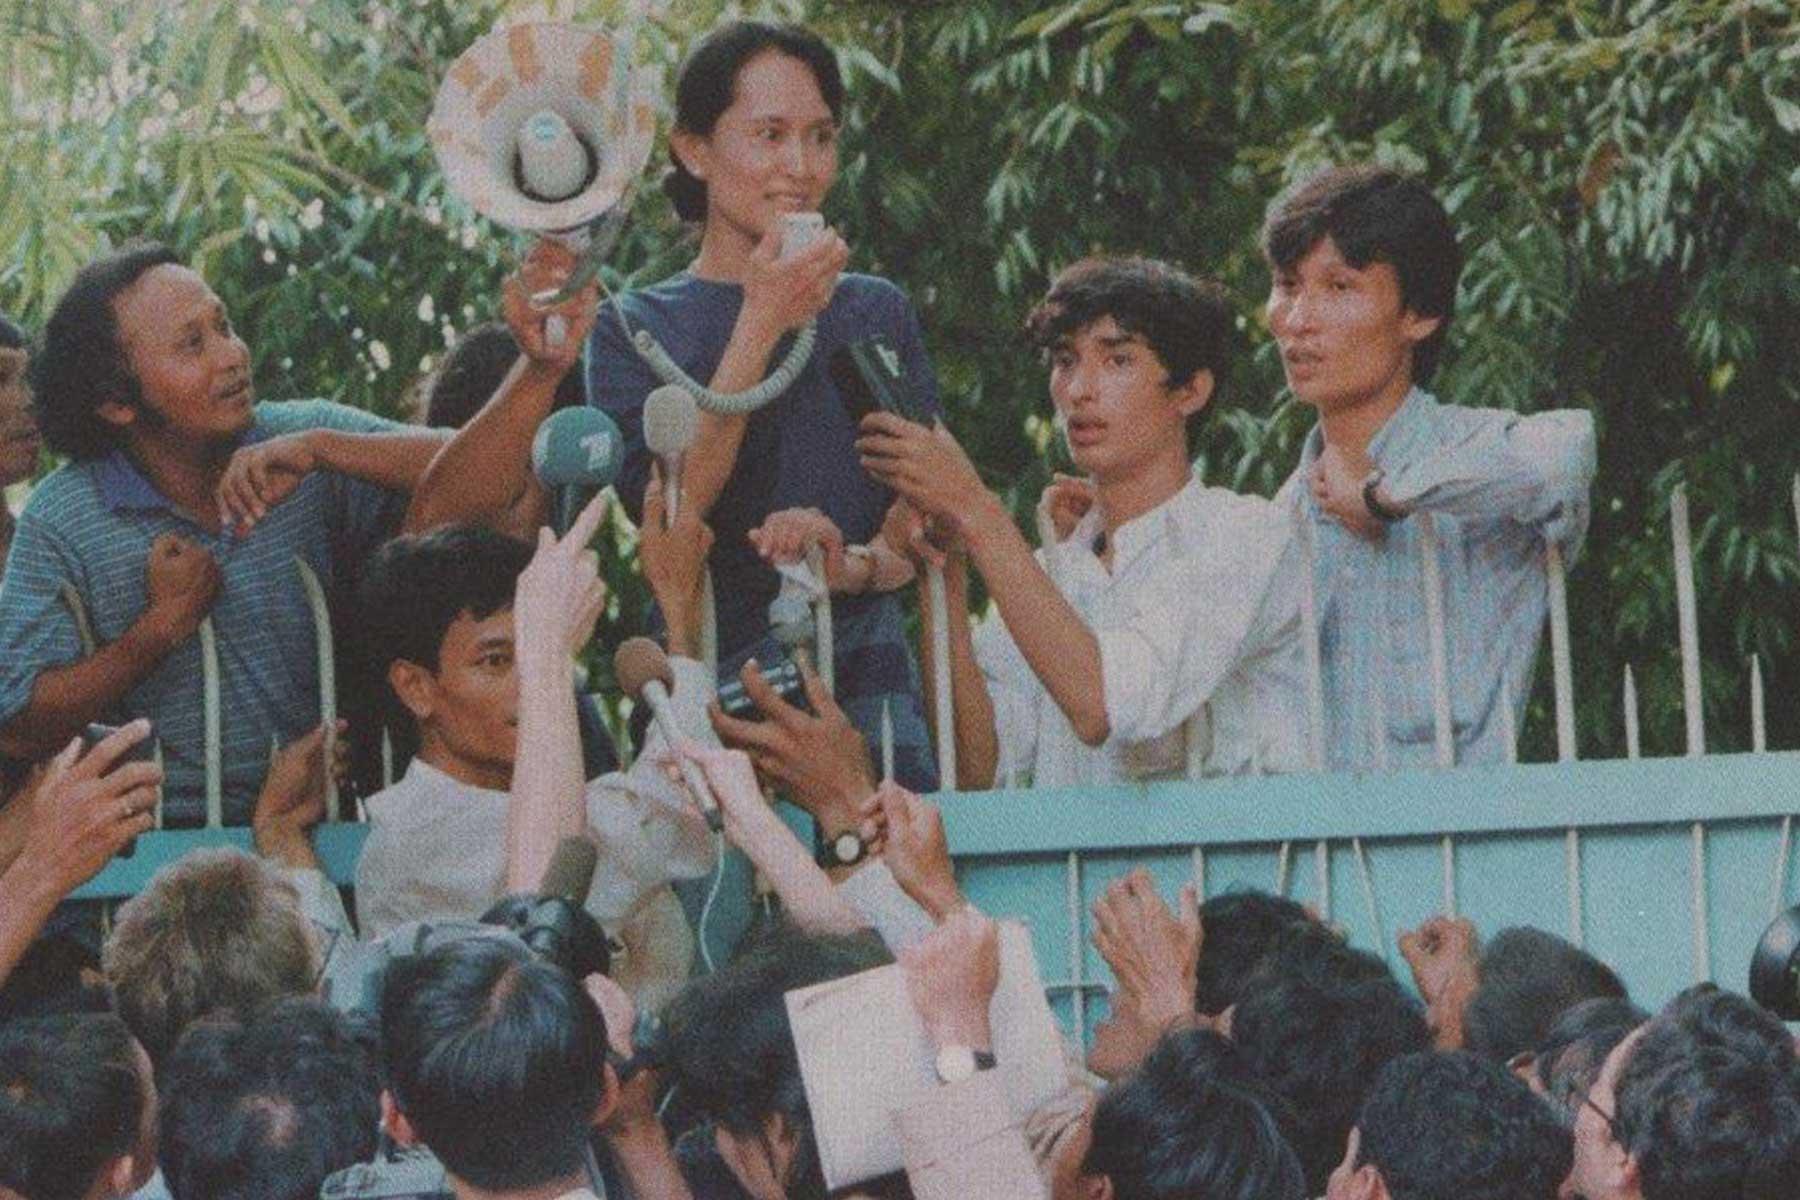 Aung San Suu Kyi speaks to a gathered crowd.